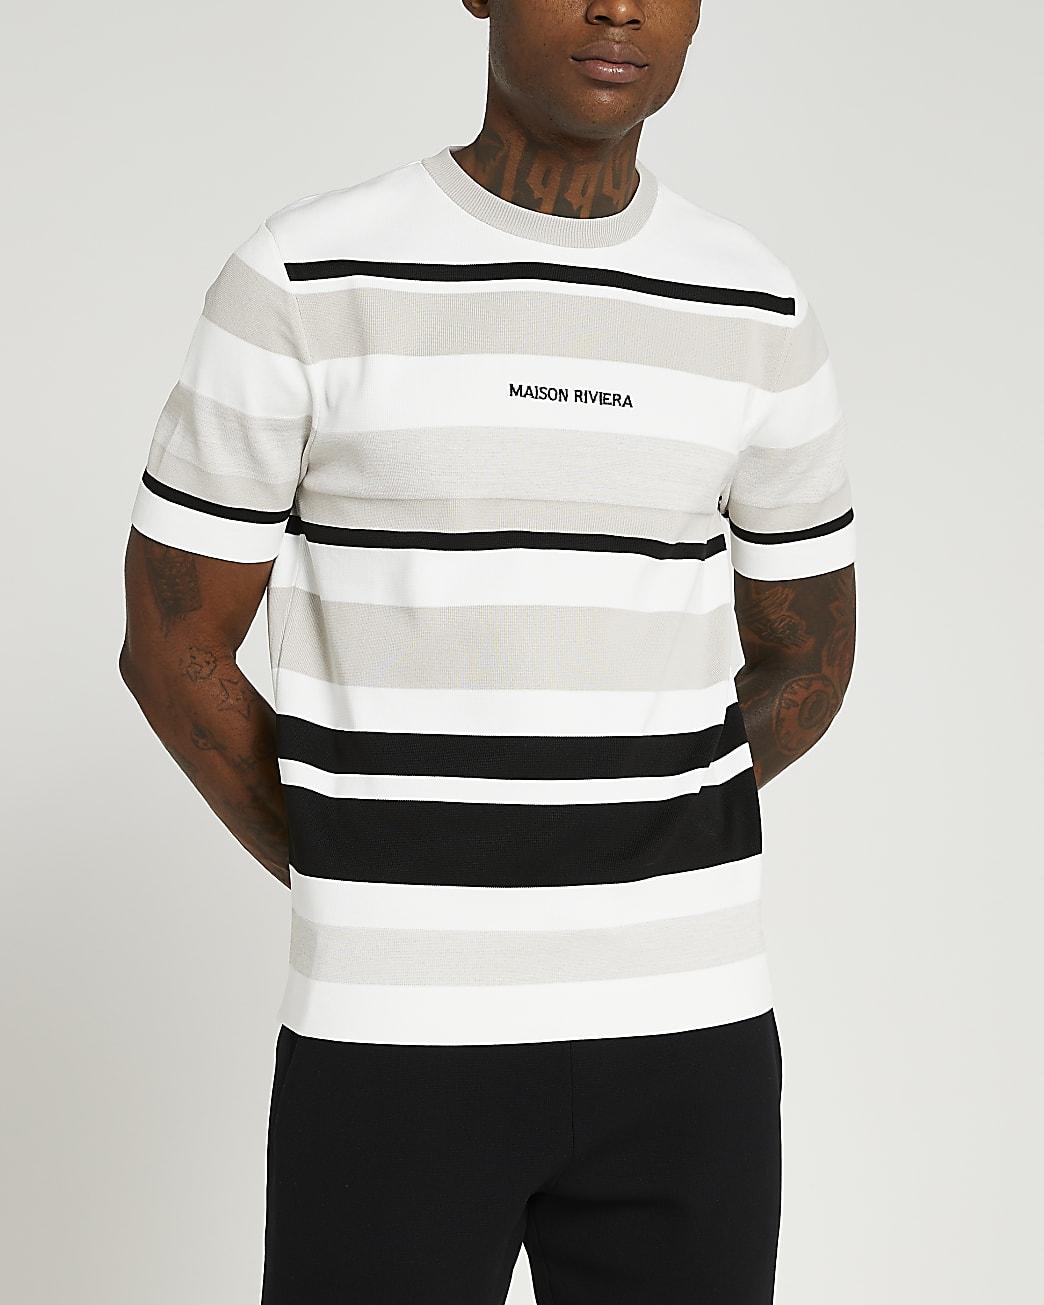 Maison Riviera stone slim fit stripe t-shirt